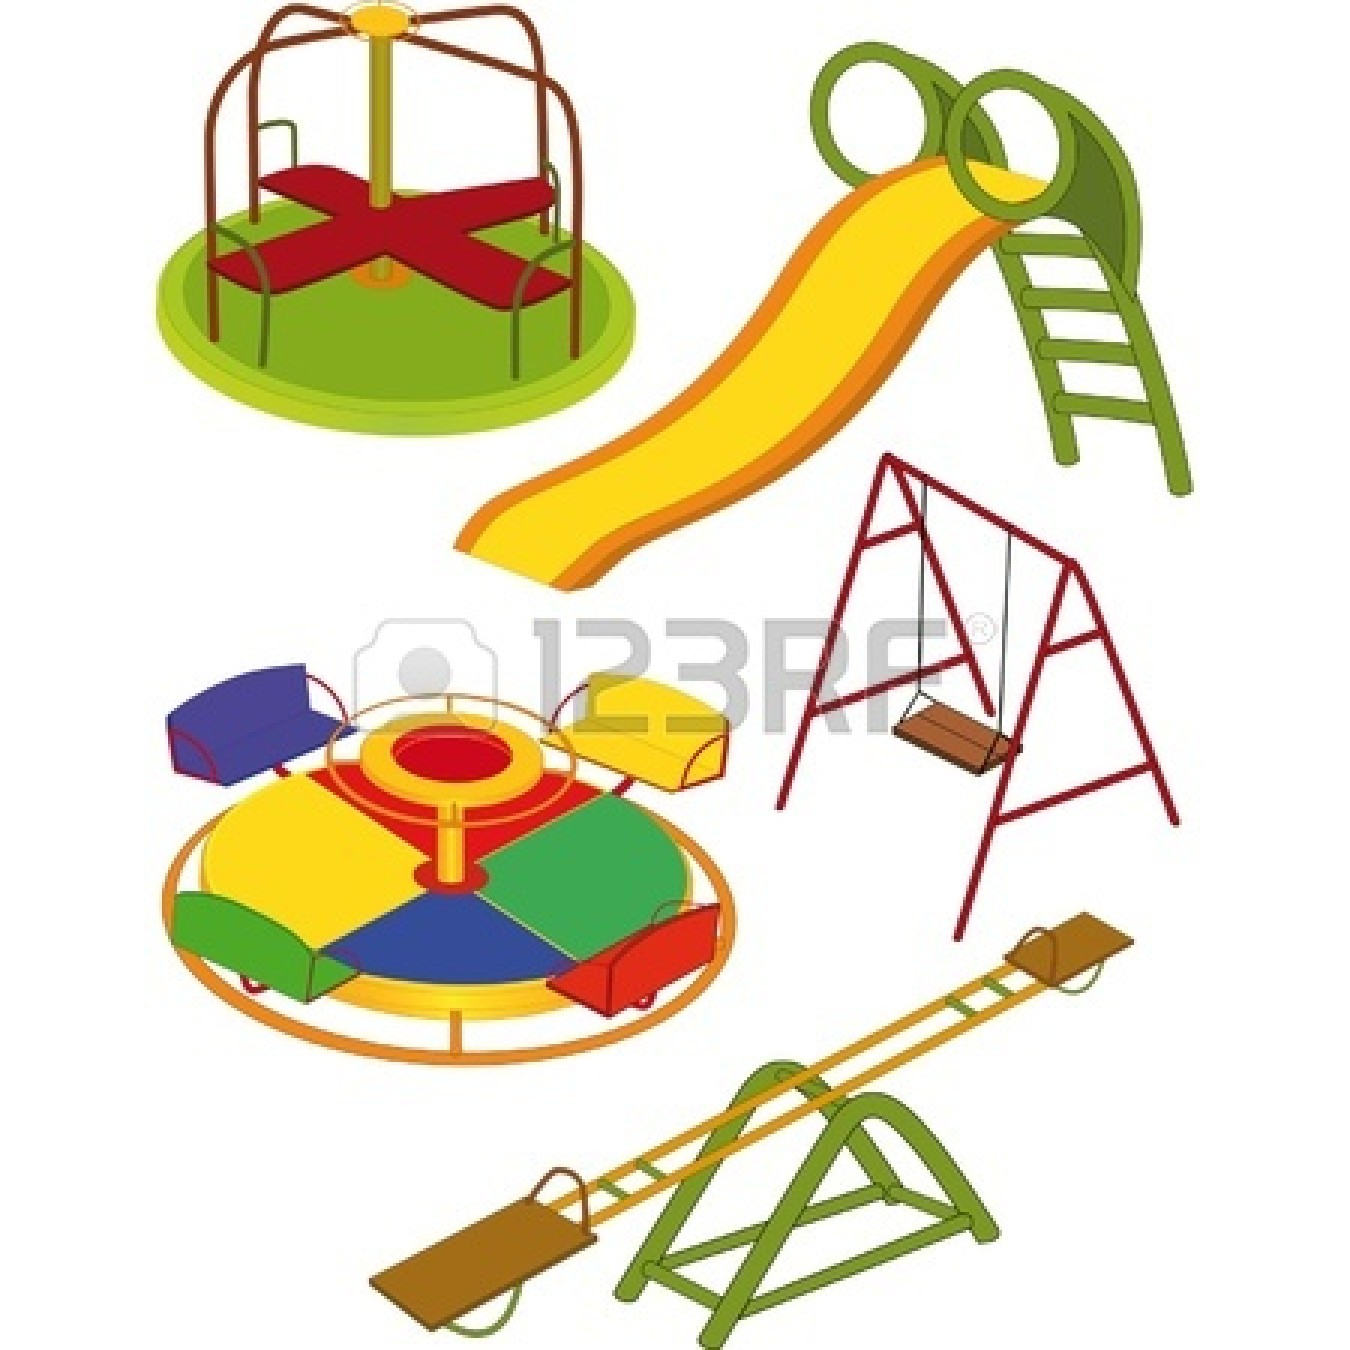 1350x1350 Swing Clipart Parque